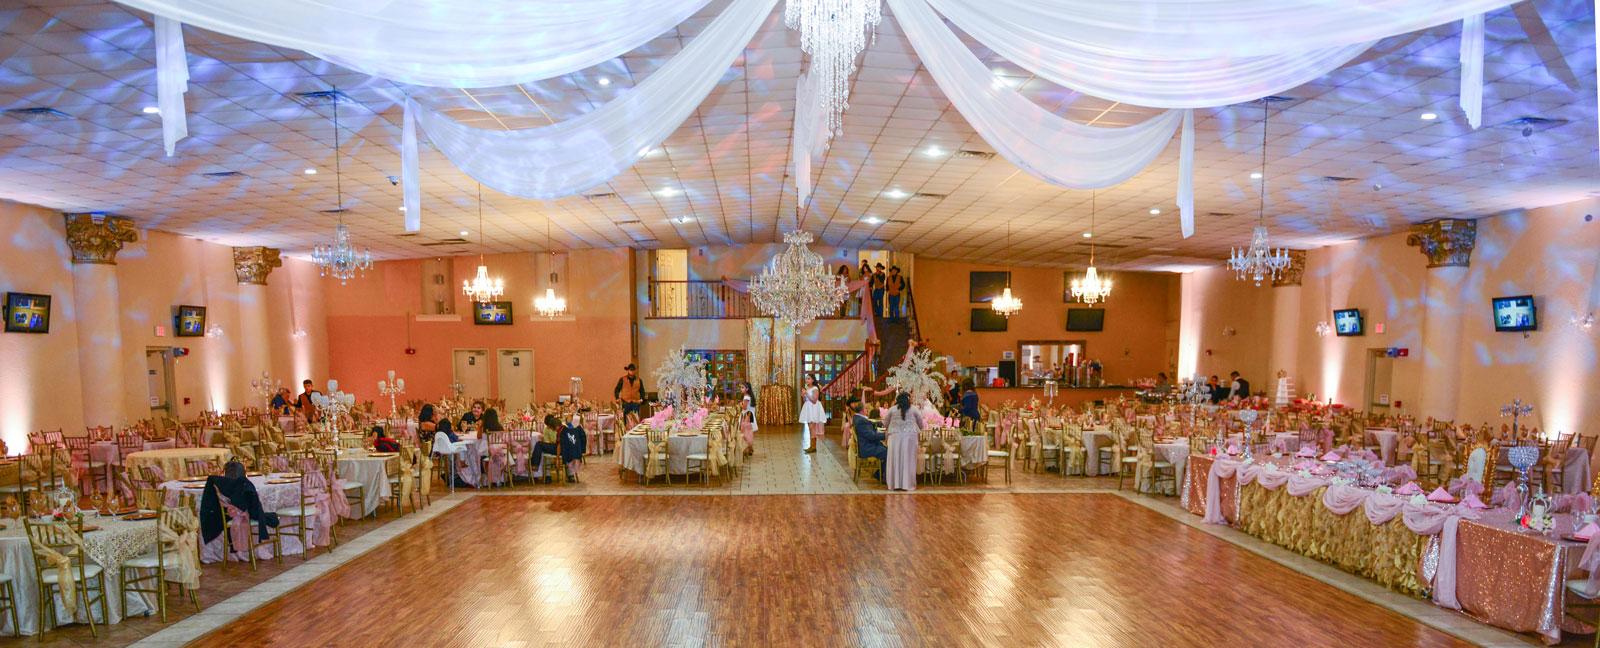 memories reception hall